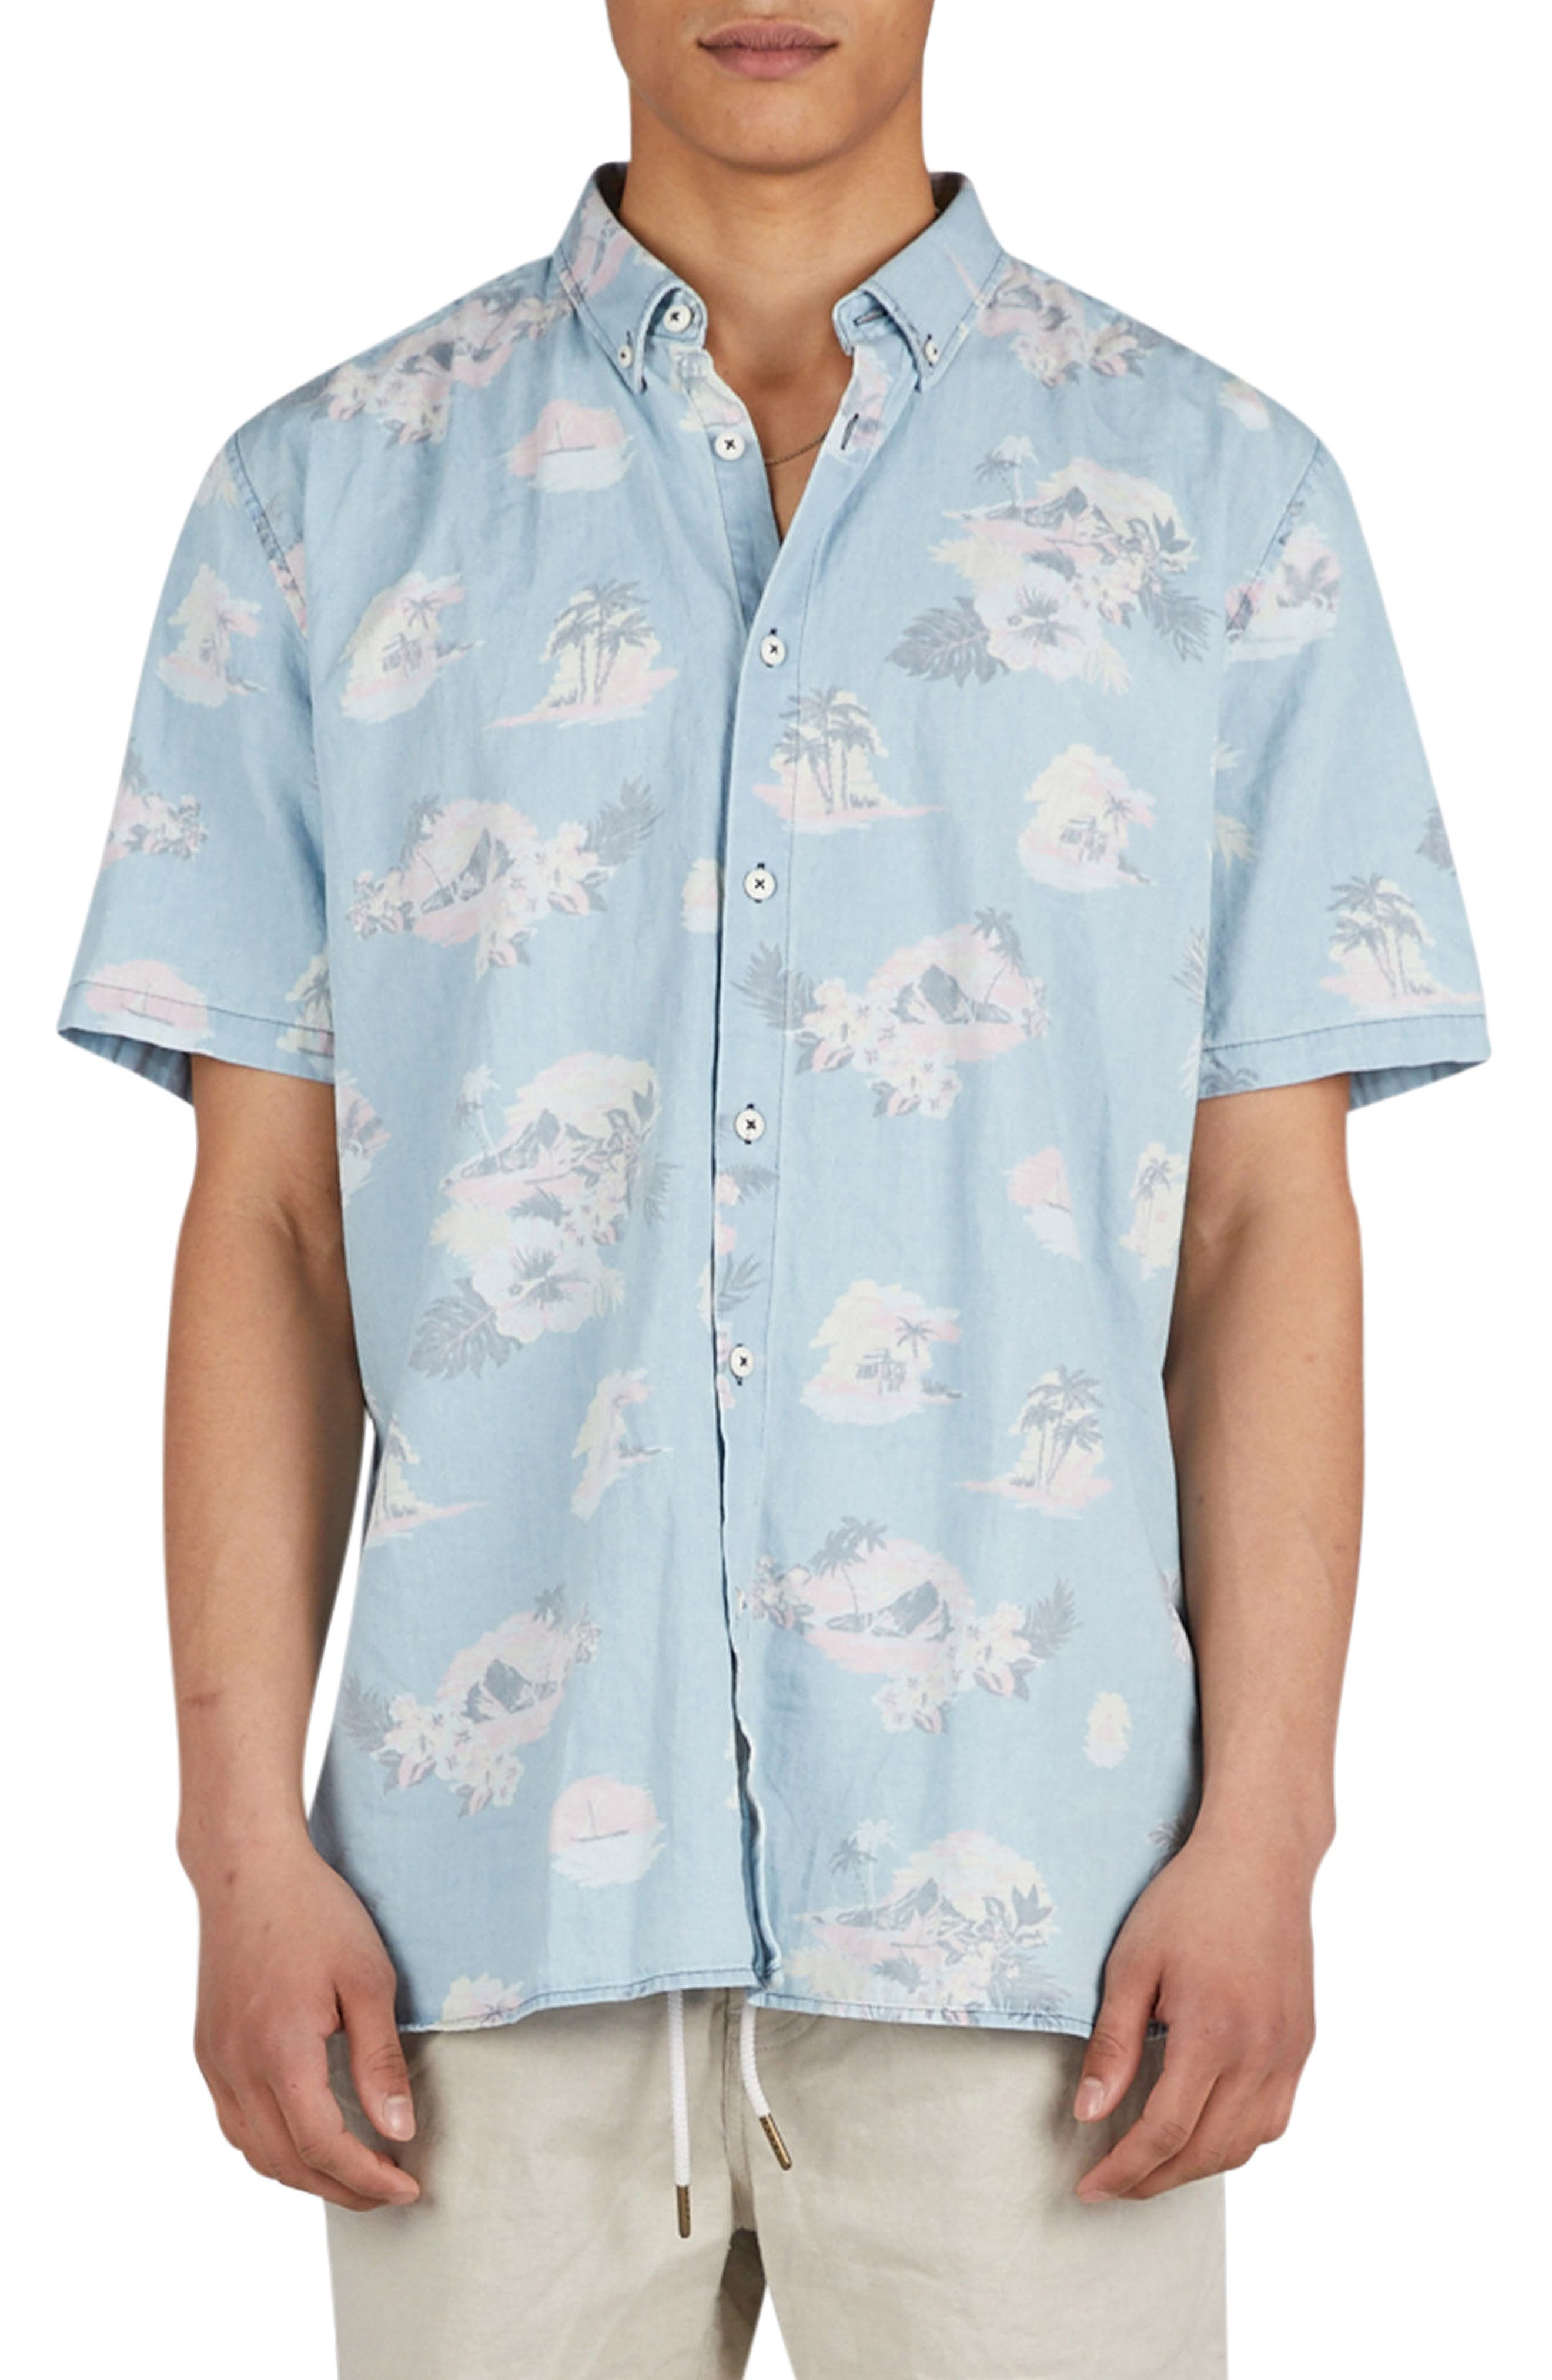 Barney Cools Tropical Print Woven Shirt